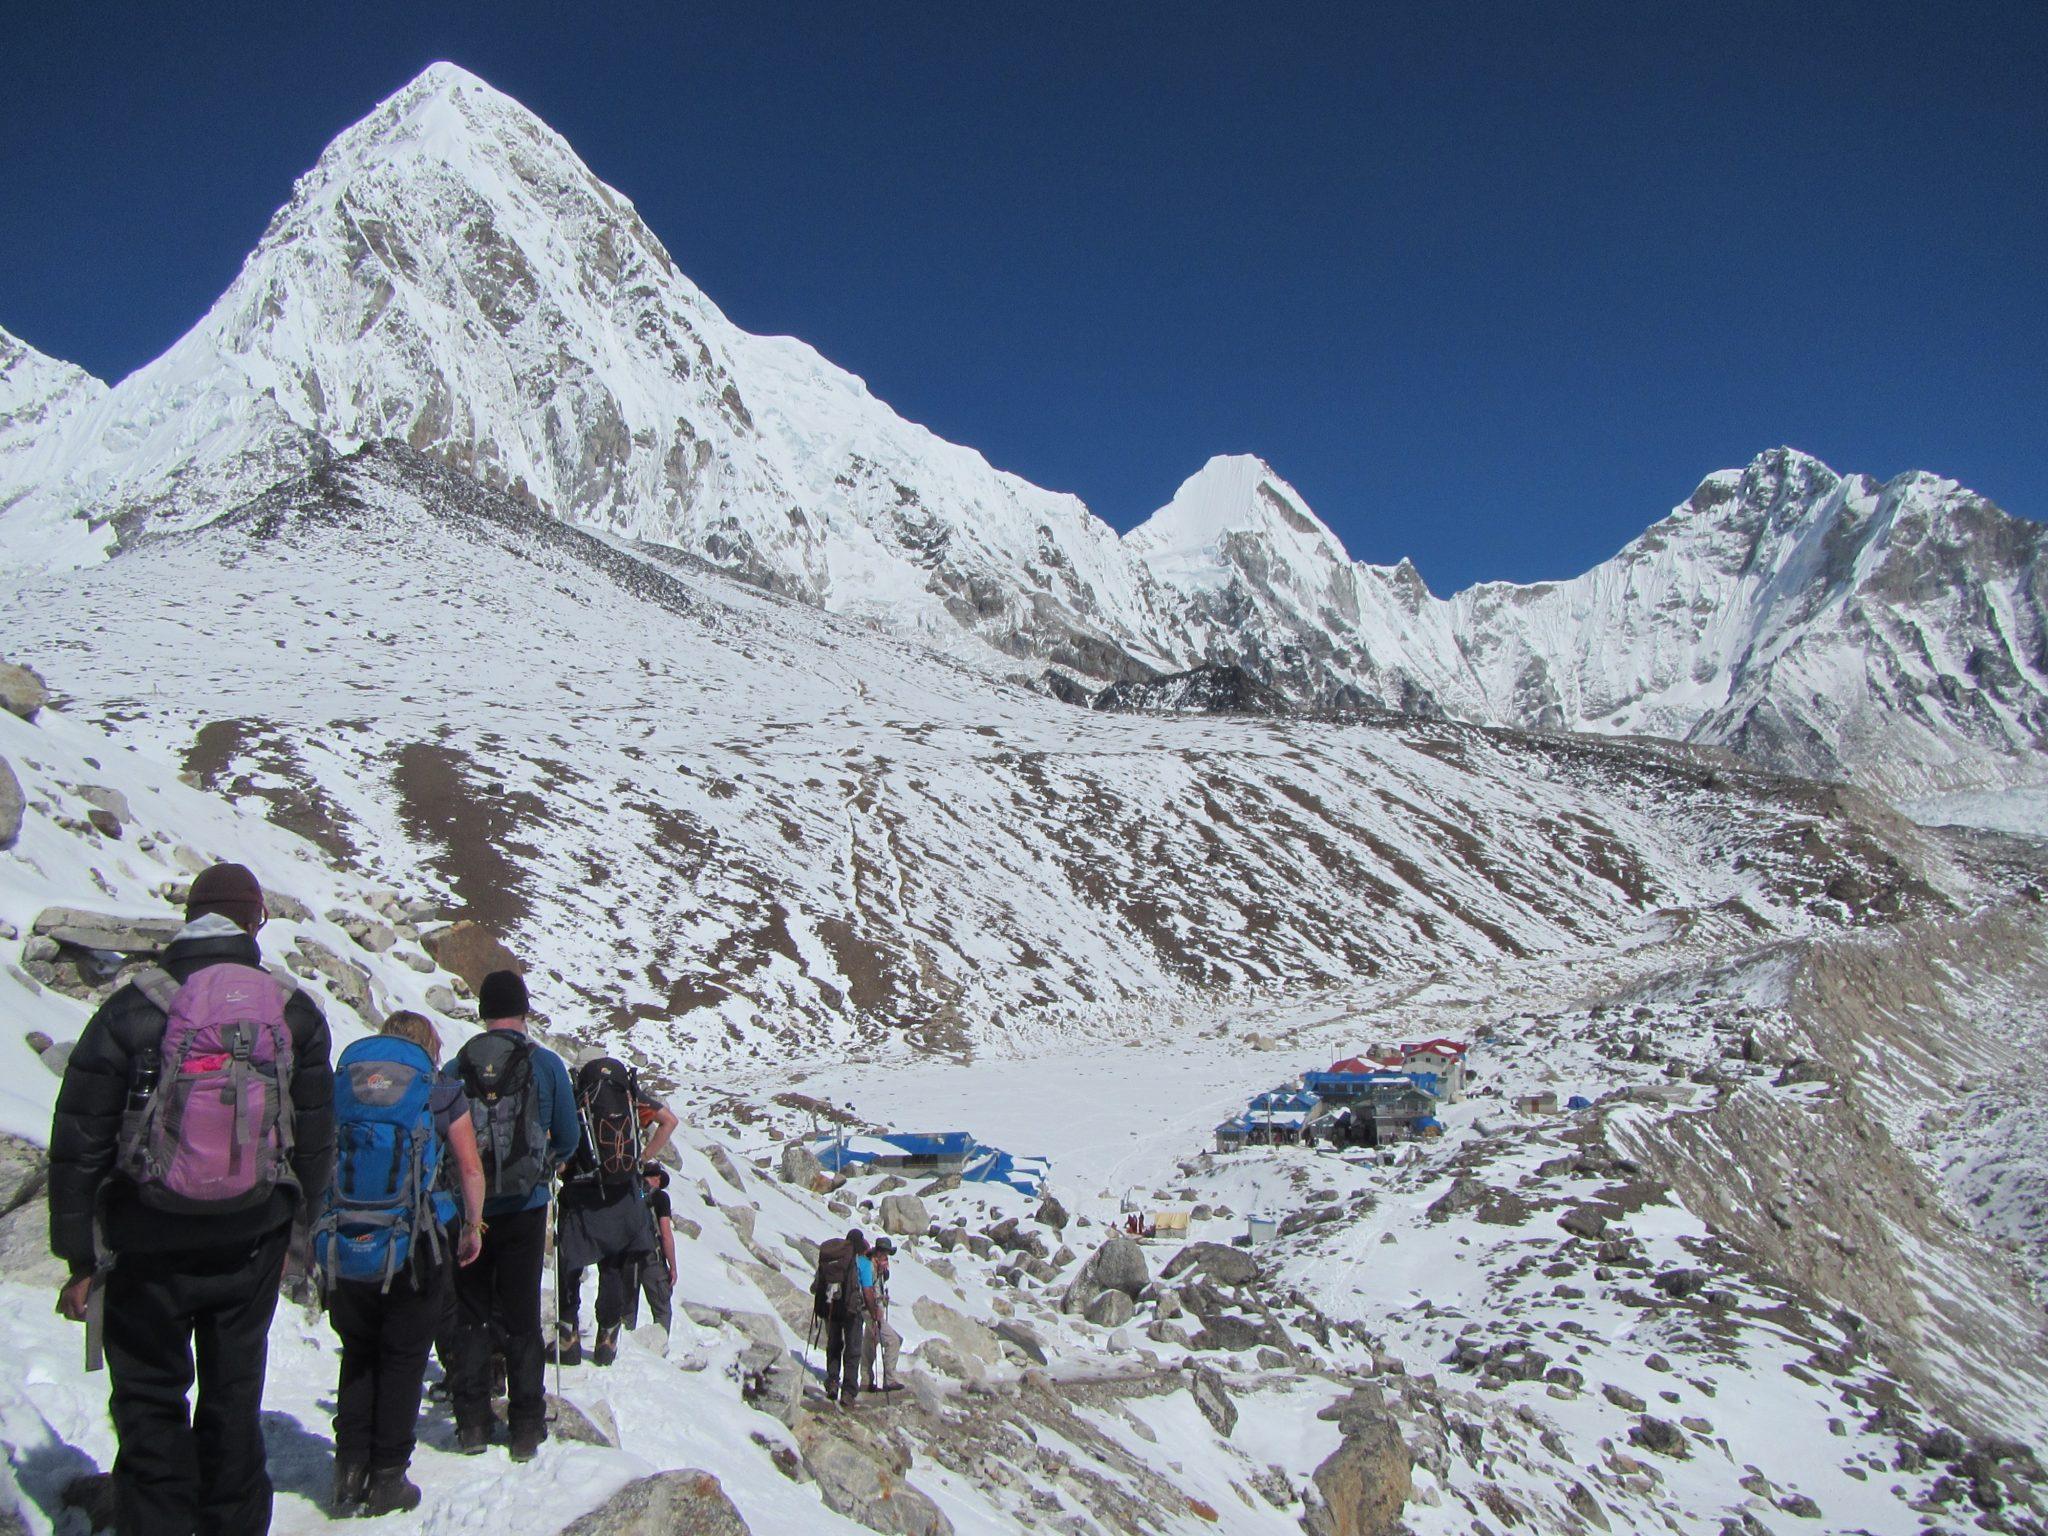 Daily Distances Traveled on the Everest Base Camp trek